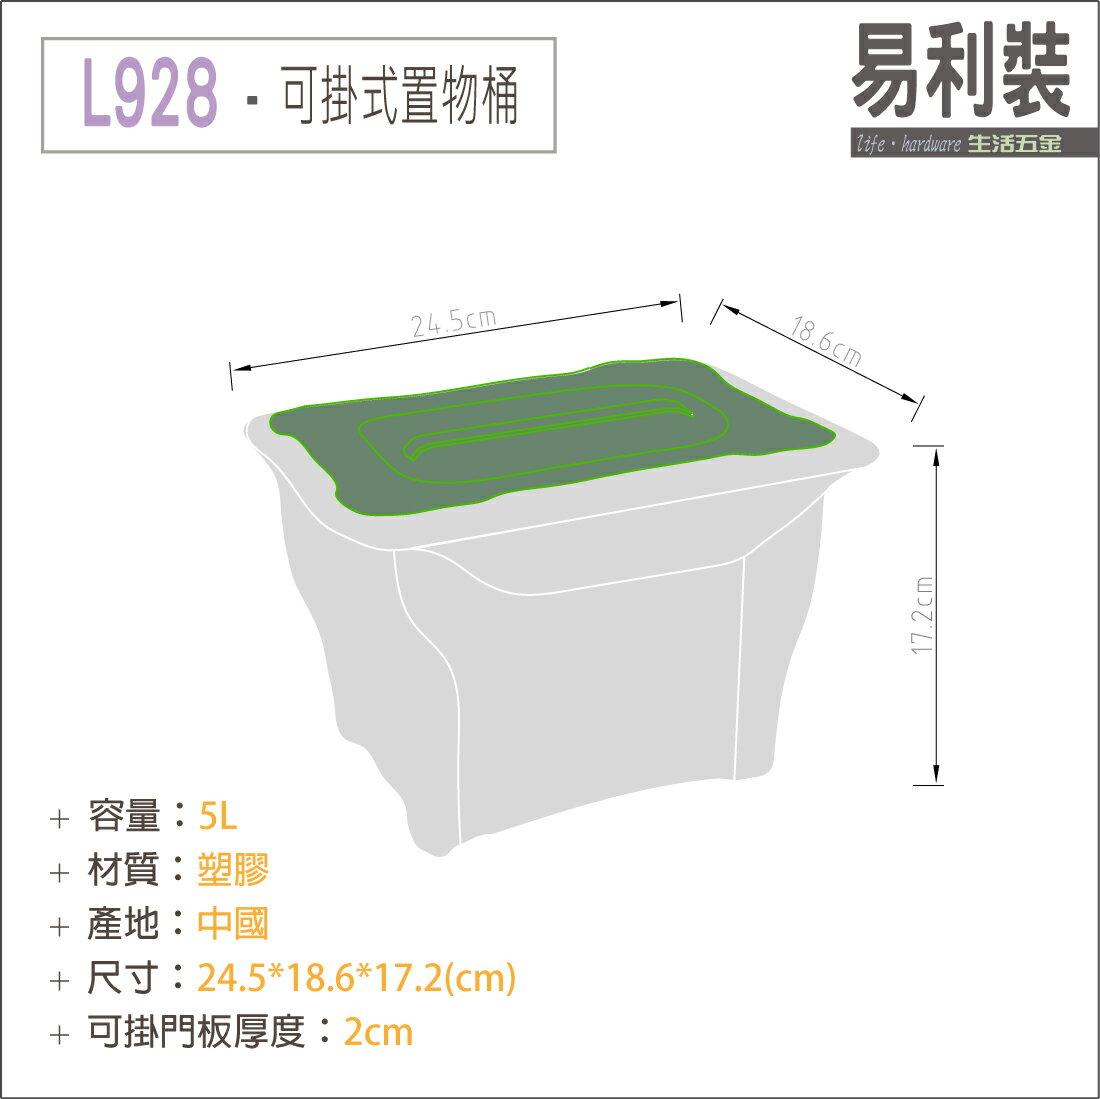 【 EASYCAN 】L 928-可掛式置物桶 易利裝生活五金 廚房清潔桶 垃圾桶 房間 臥房 衣櫃 小資族 辦公家具 系統家具 0